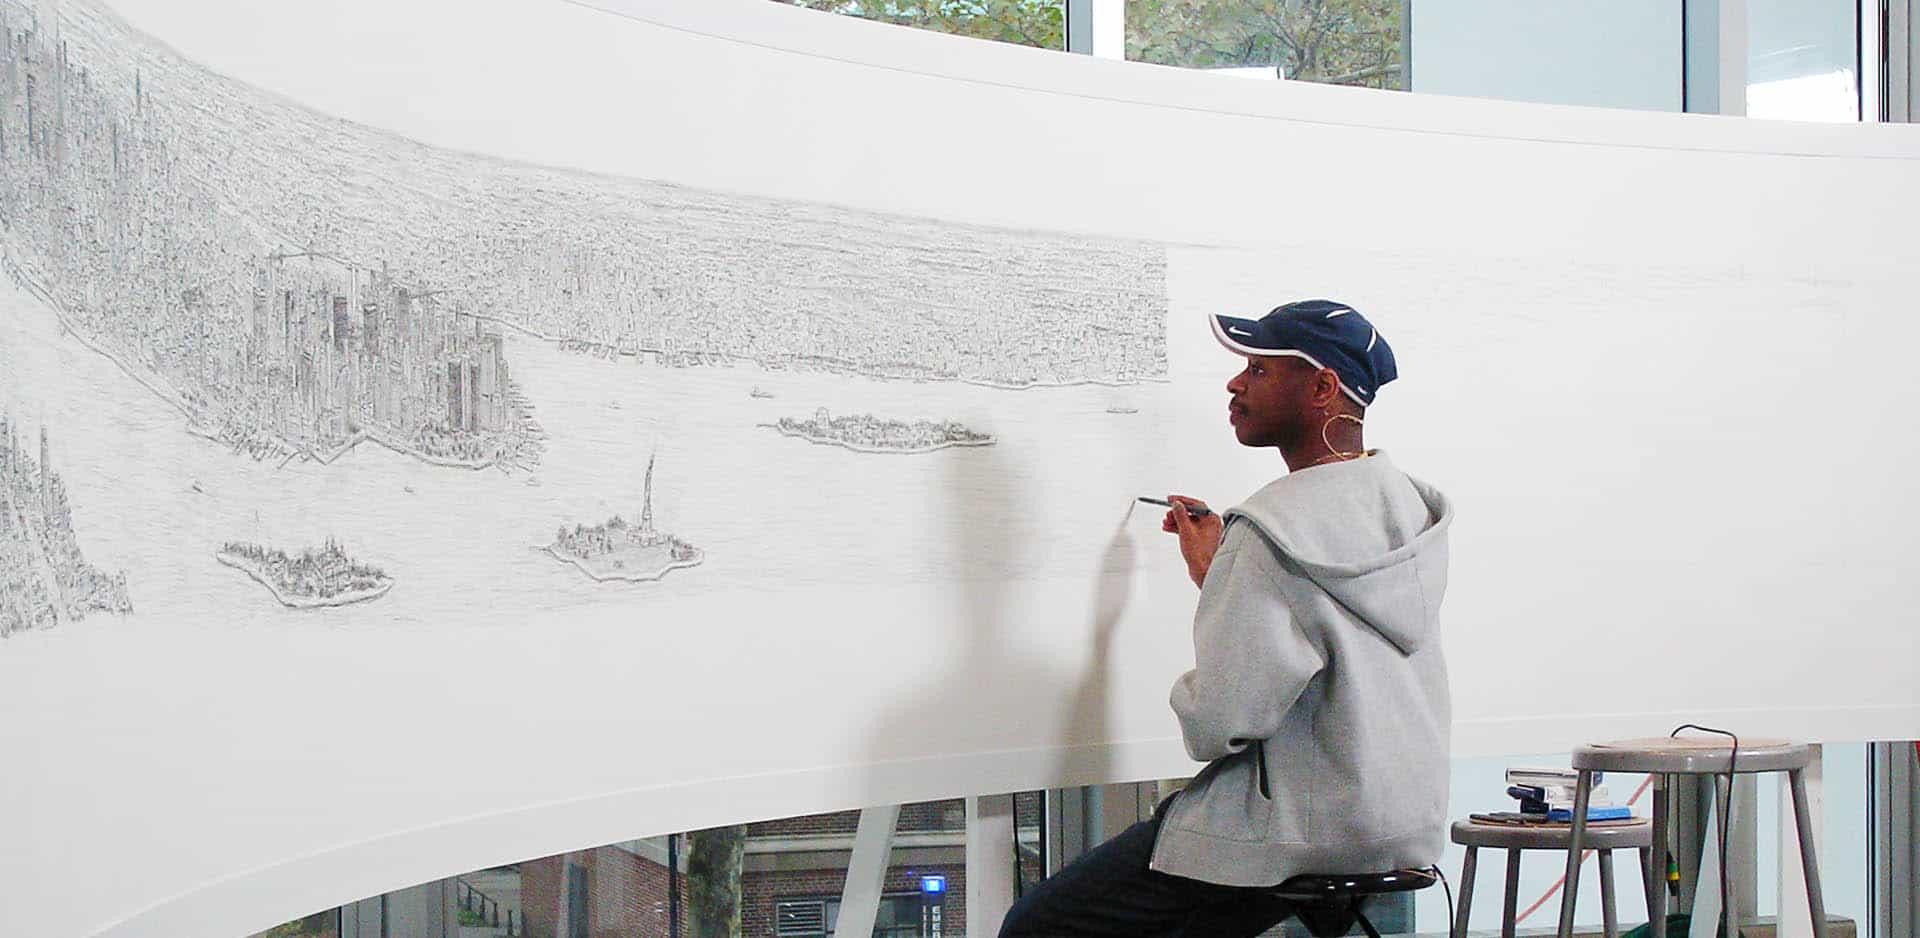 Stephen Wiltshire draws New York Panorama